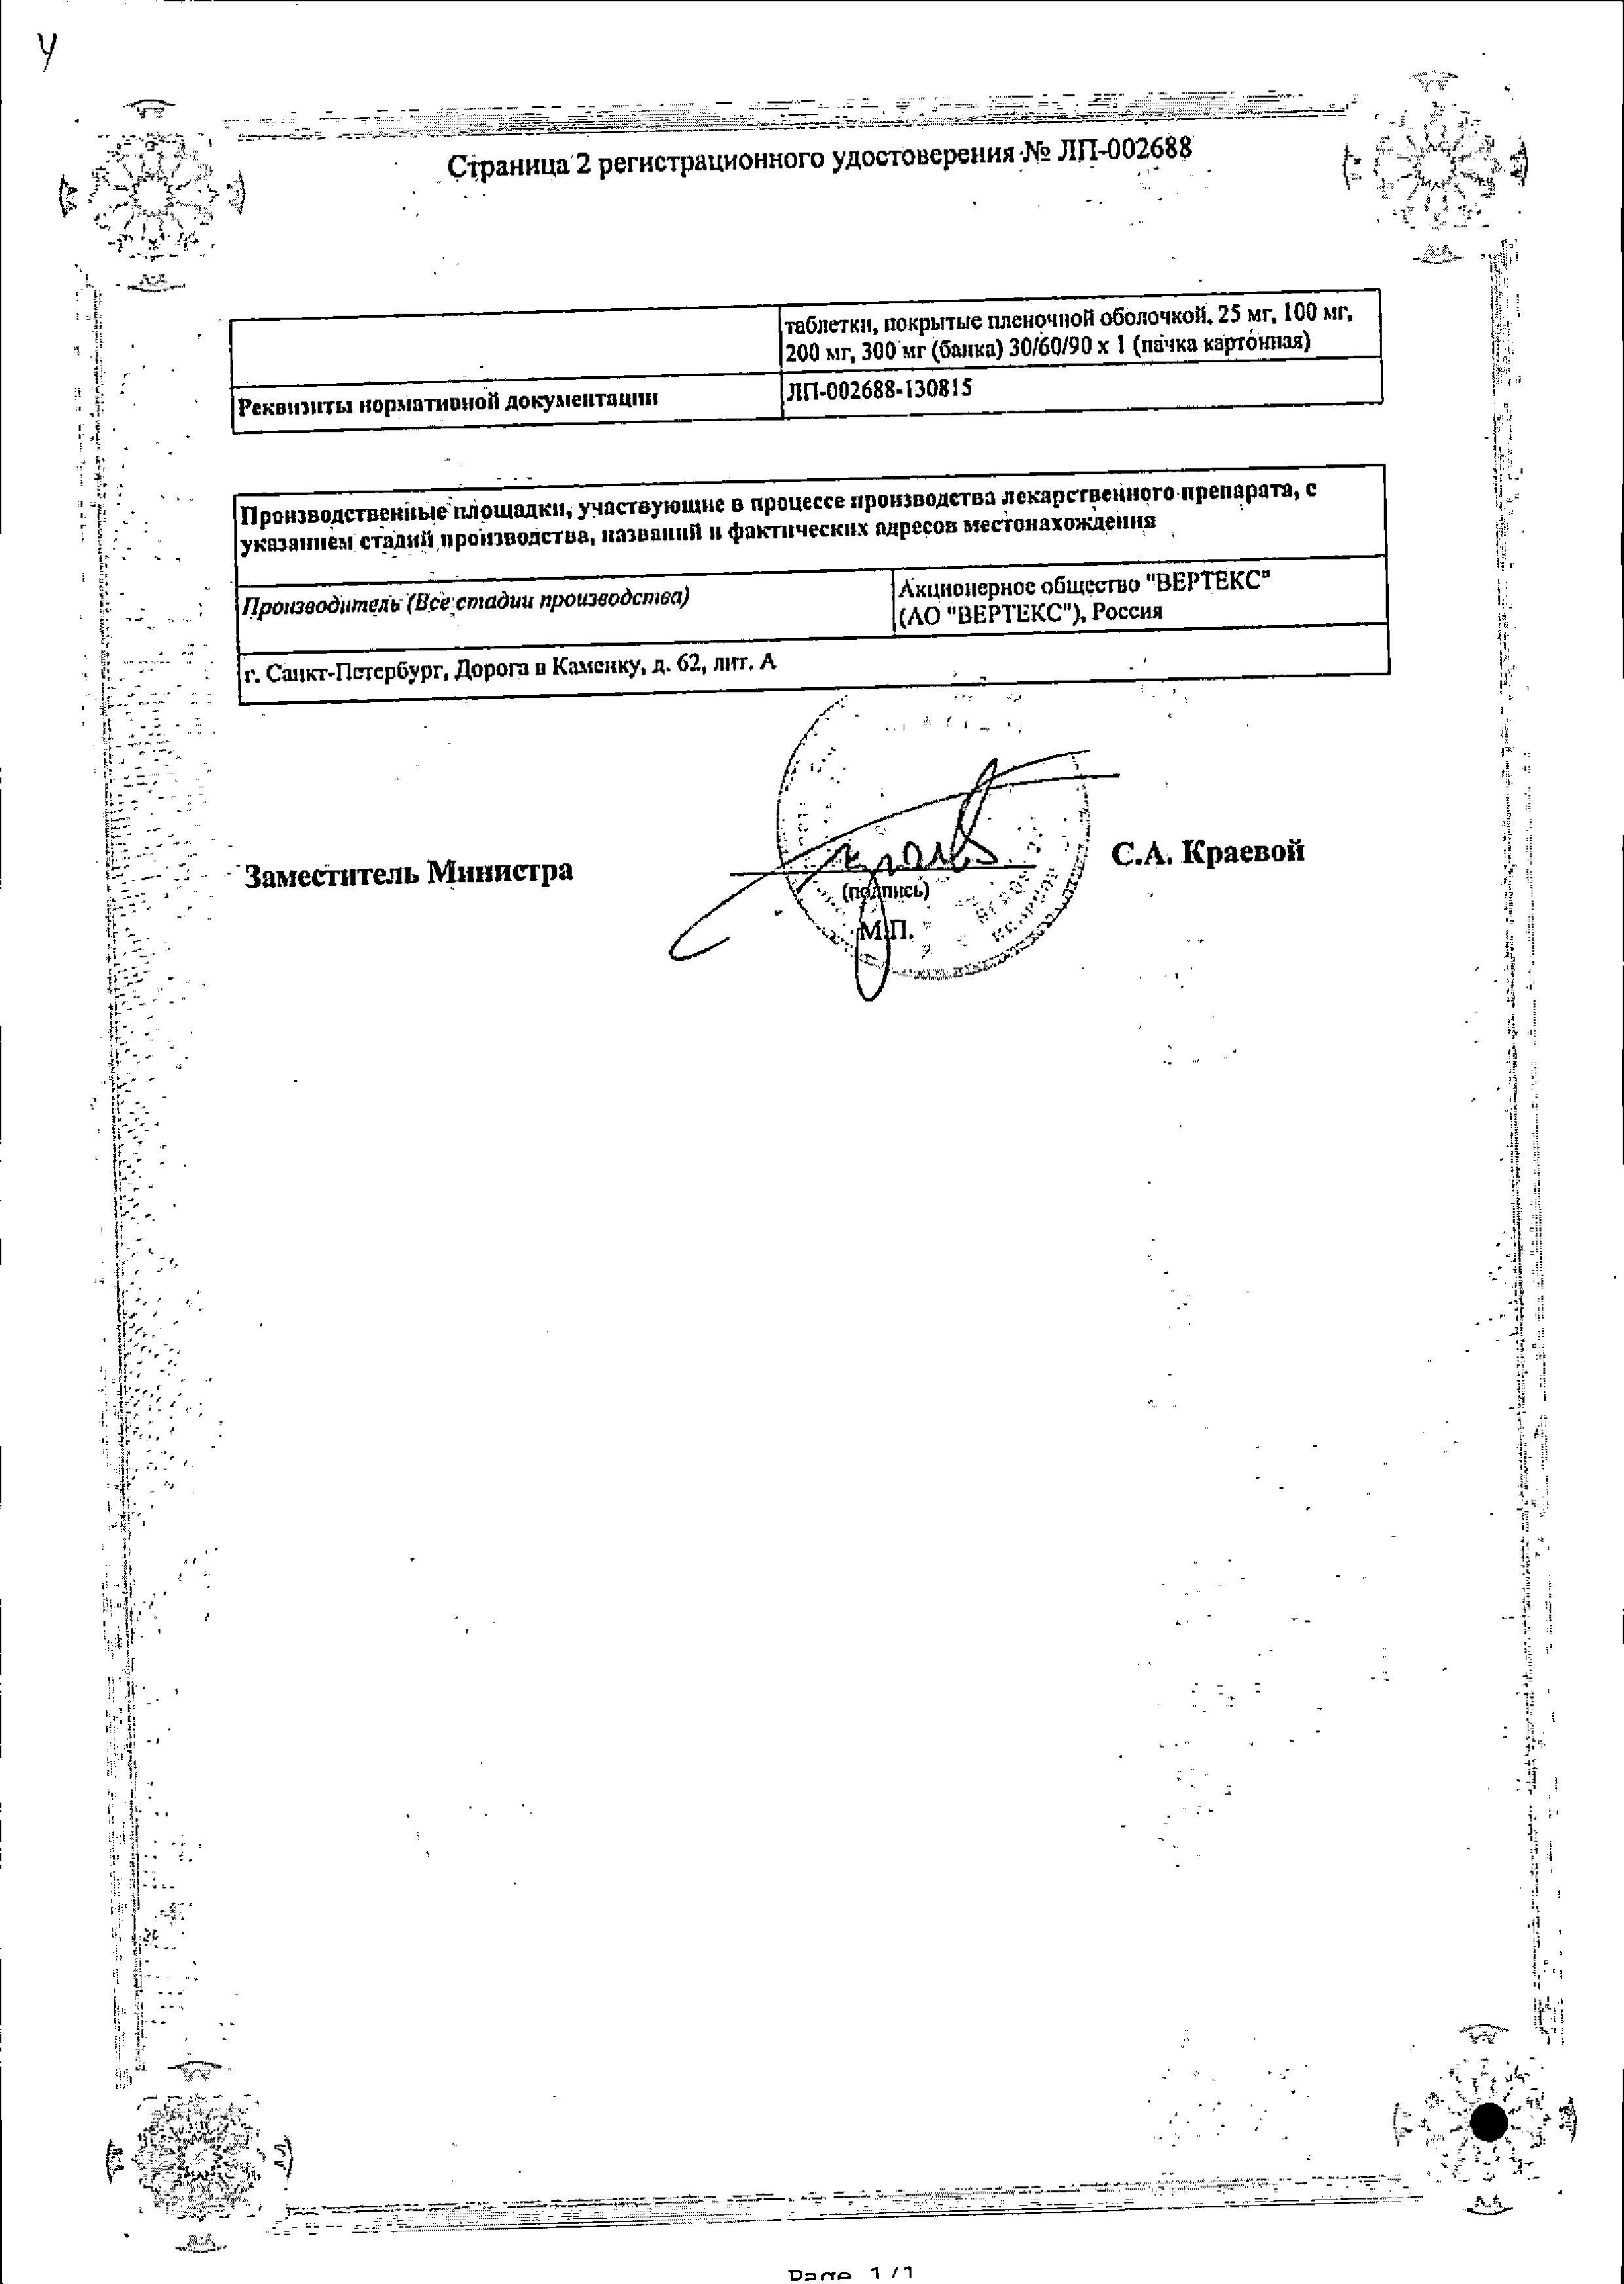 Кветиапин сертификат